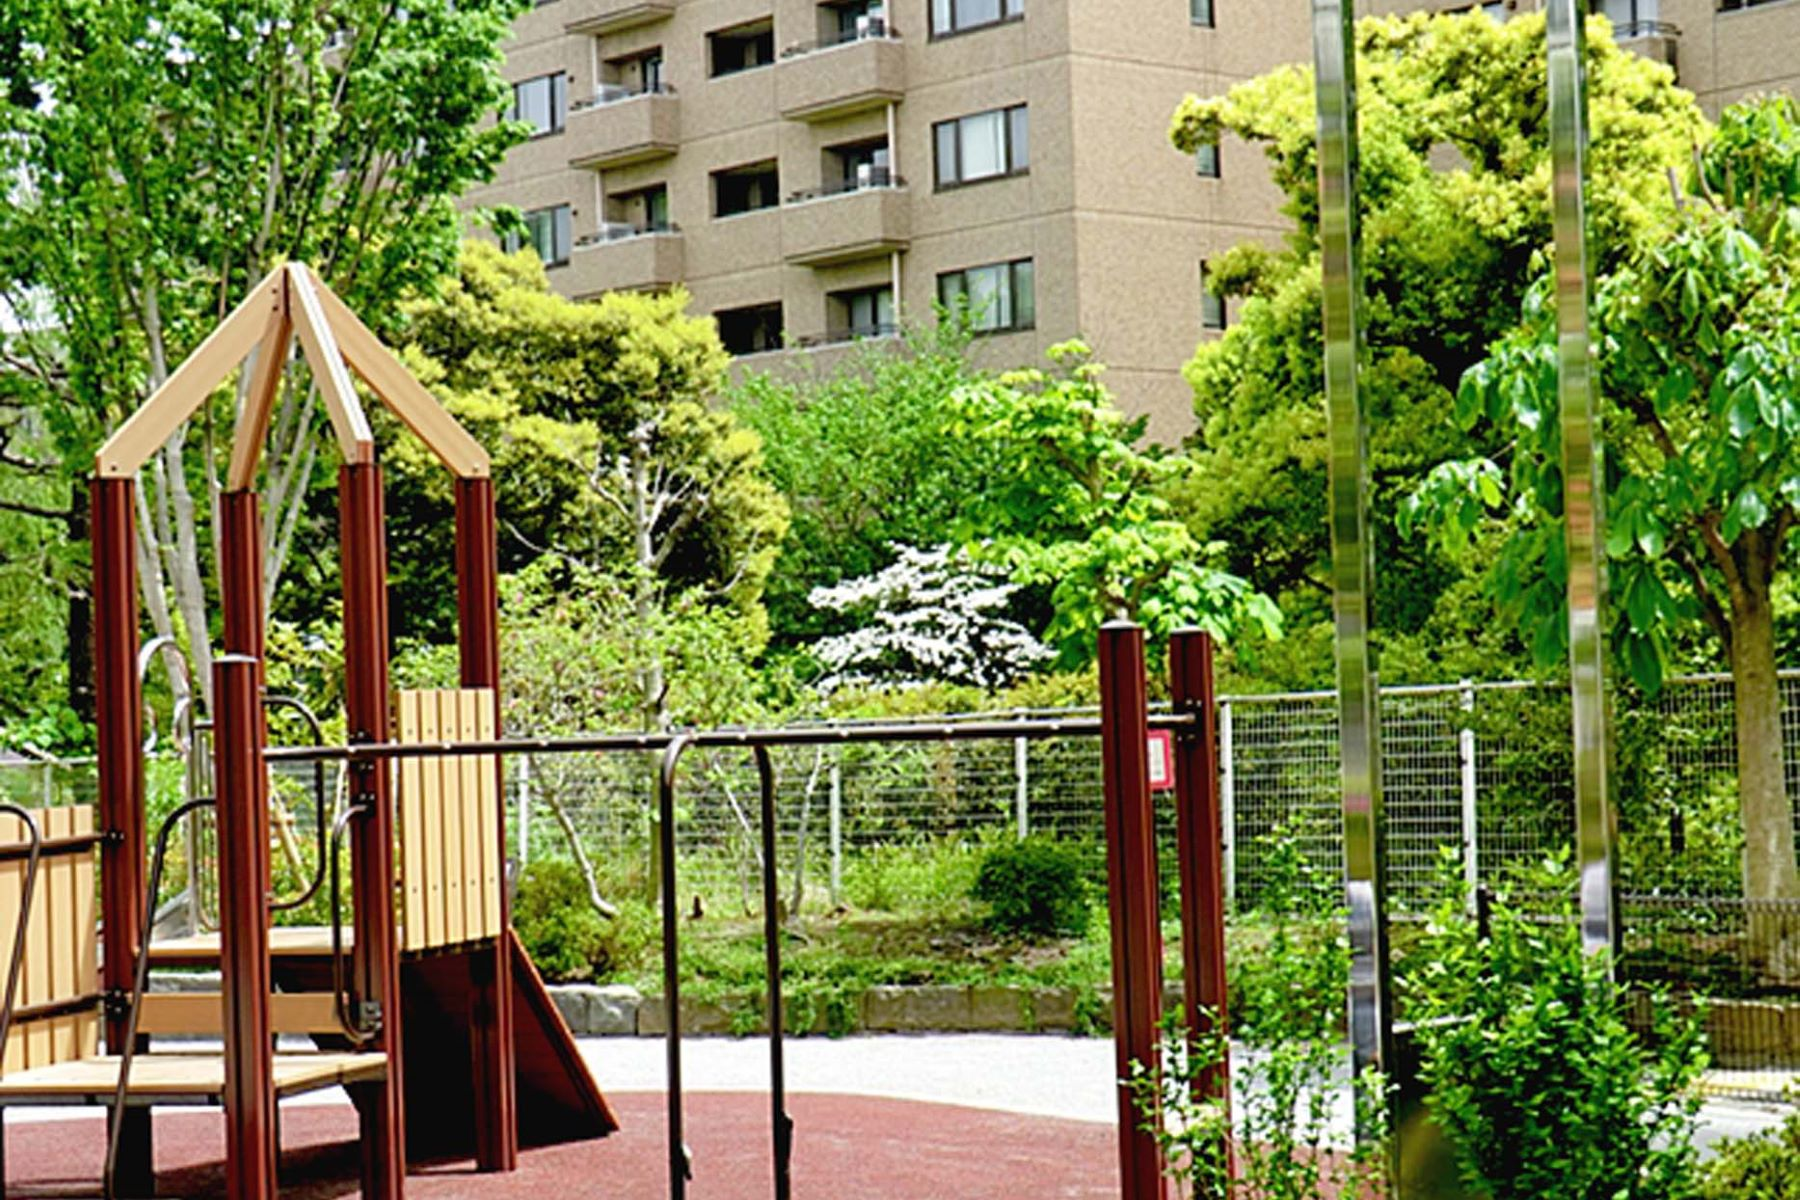 Land for Sale at Shibuya 4, Land Shibuya-Ku, Tokyo Japan